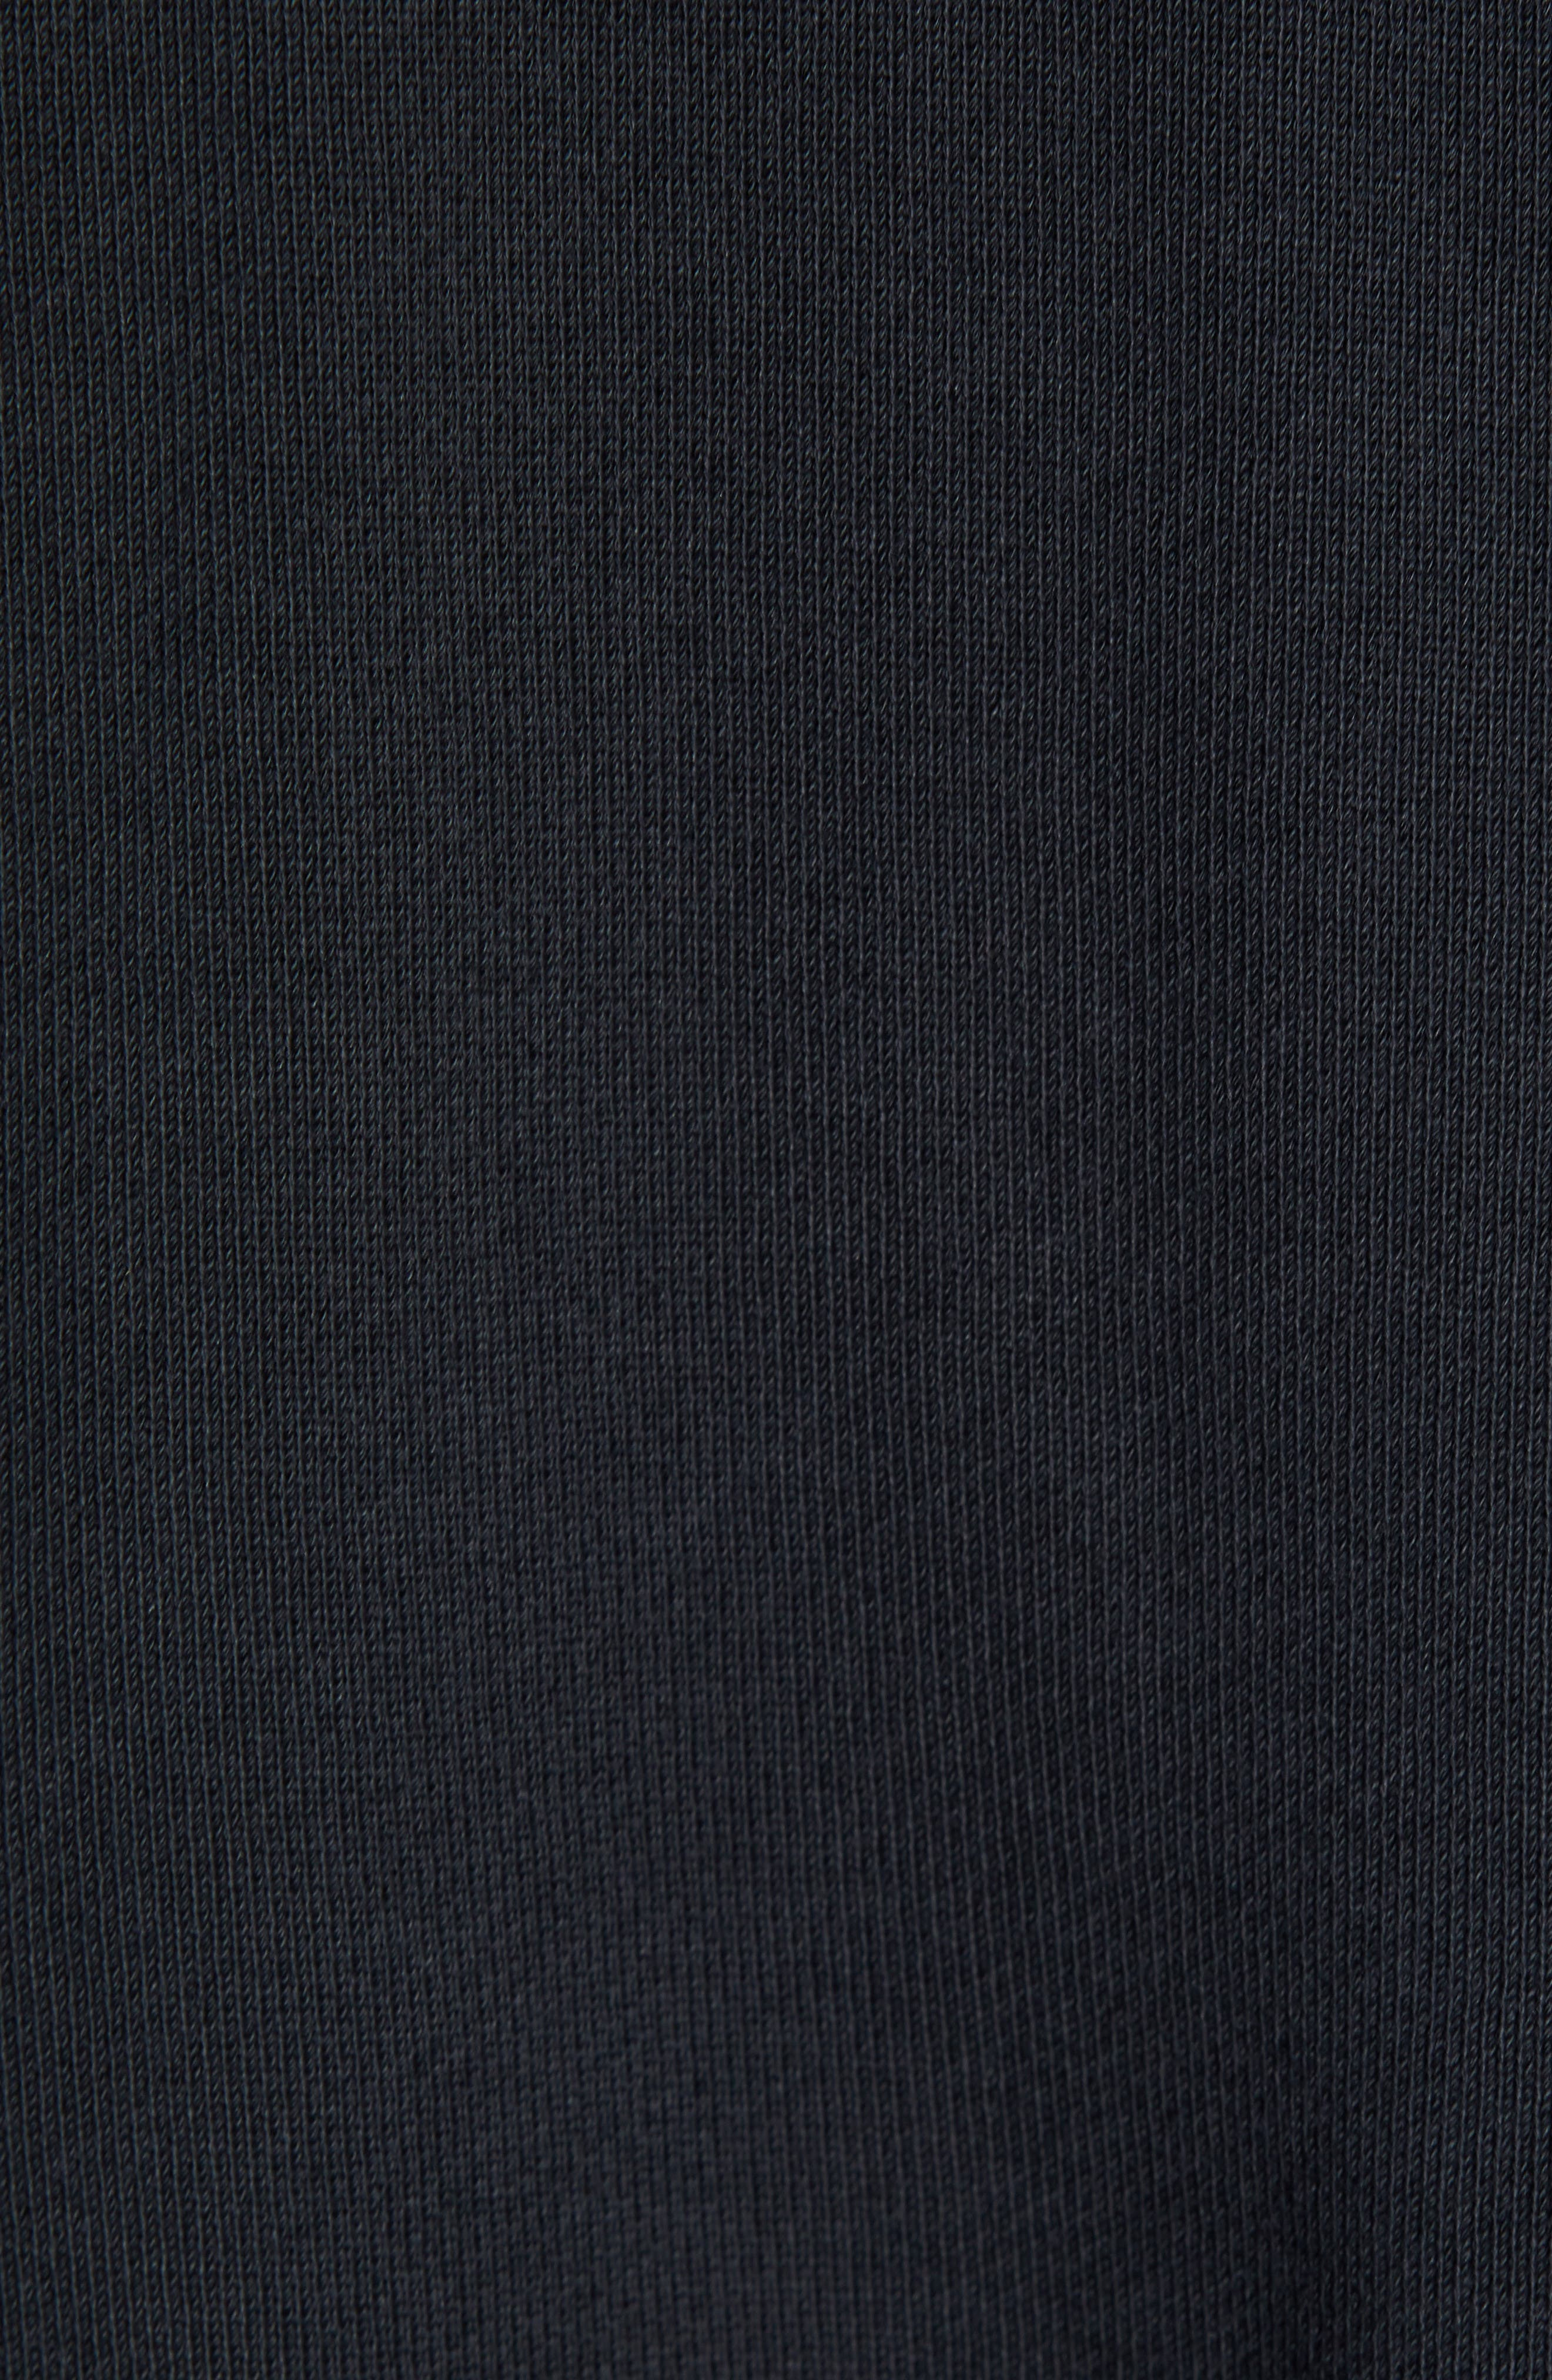 NIKE, Sportswear NSW Men's French Terry Hoodie, Alternate thumbnail 5, color, BLACK/ WHITE